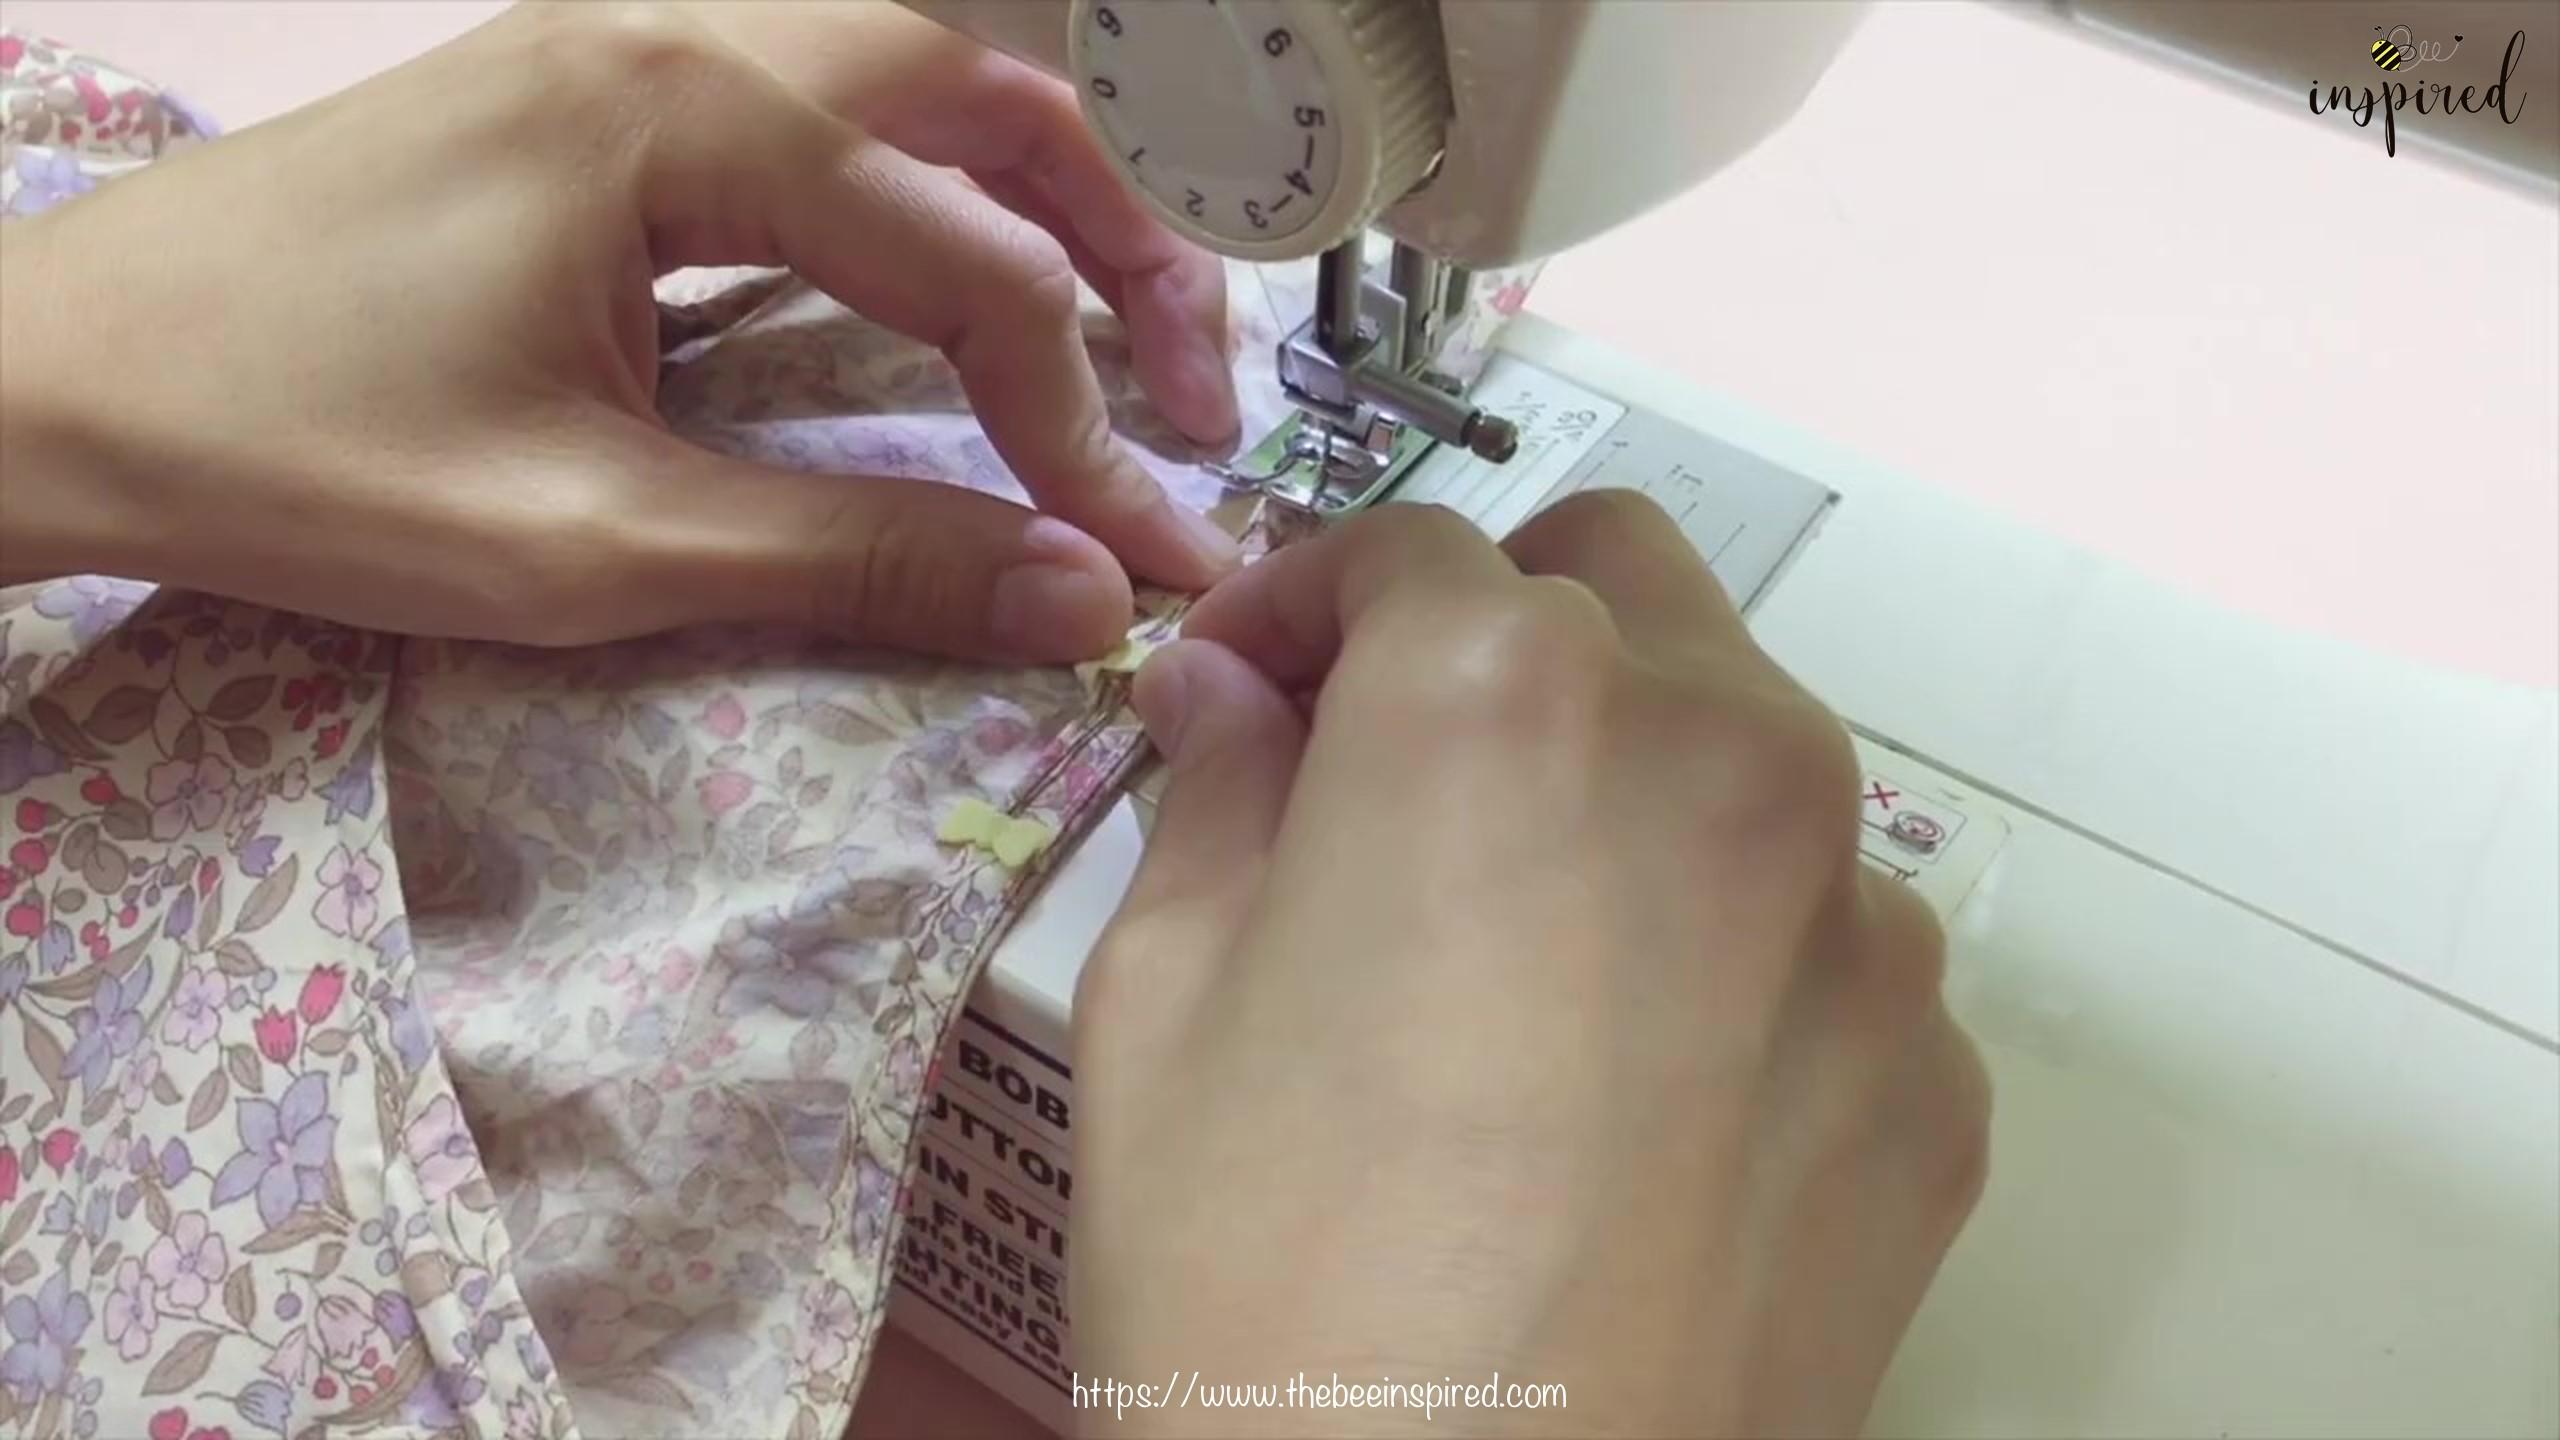 DIY 5 วิธีทำป้ายโลโก้แบรนด์ตัวเองที่บ้านแบบง่ายๆ I How to Make Your Own Fabric Labels at Home_19